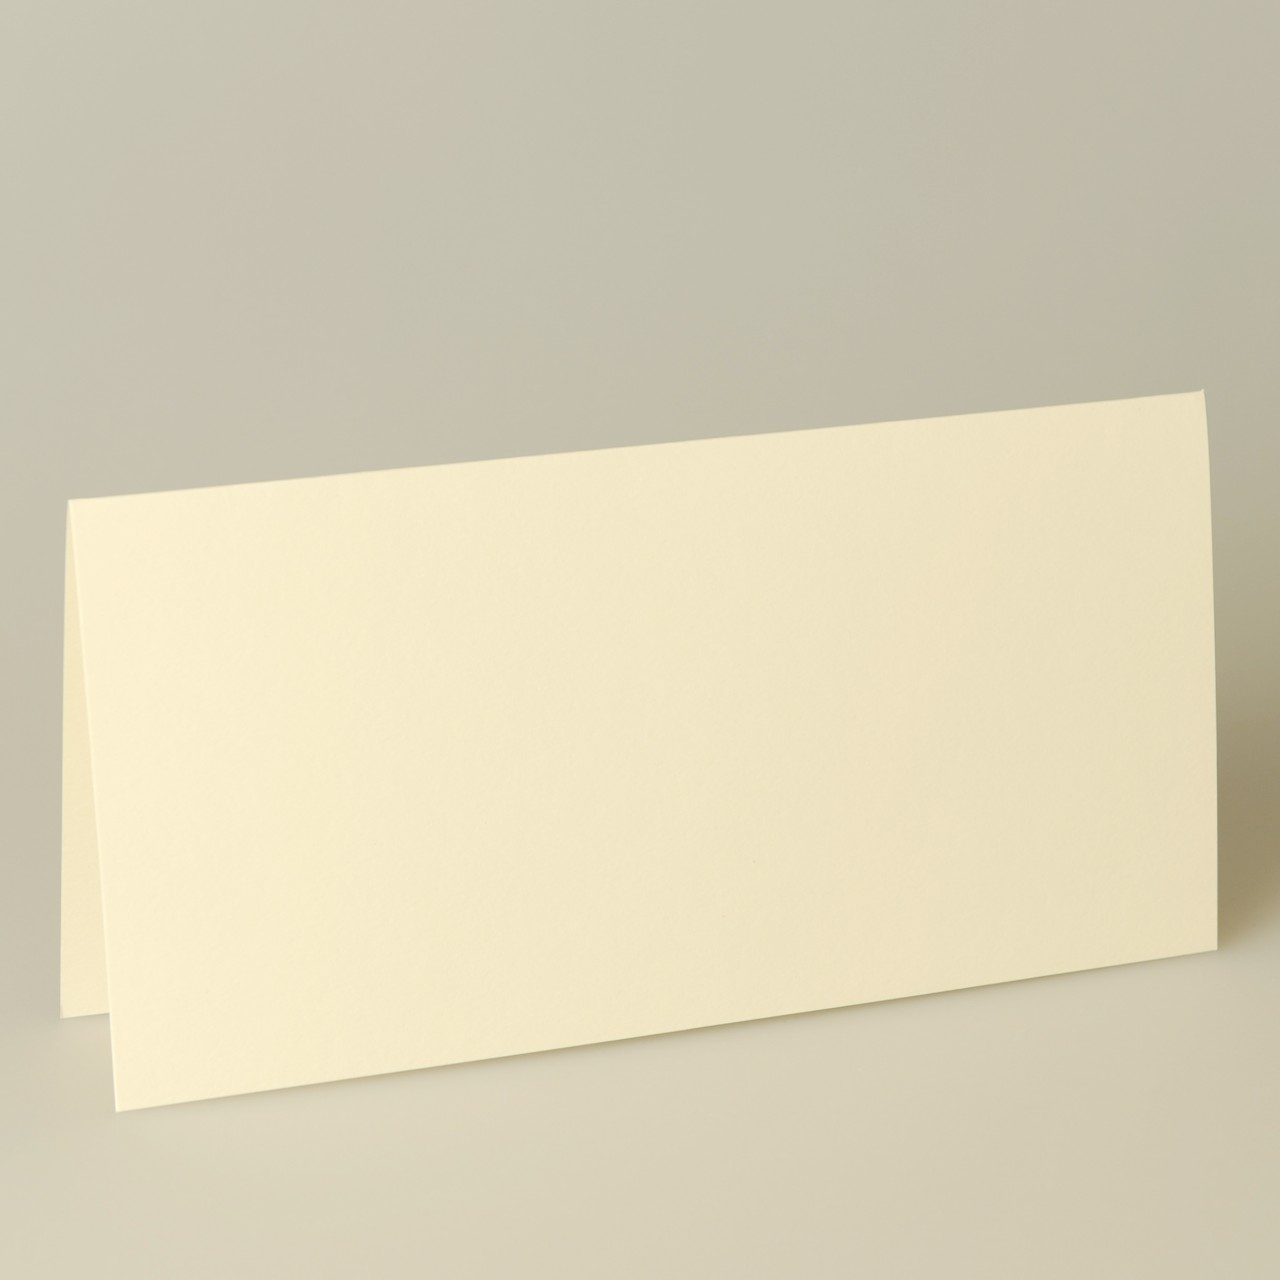 Blancokarte - B 3786